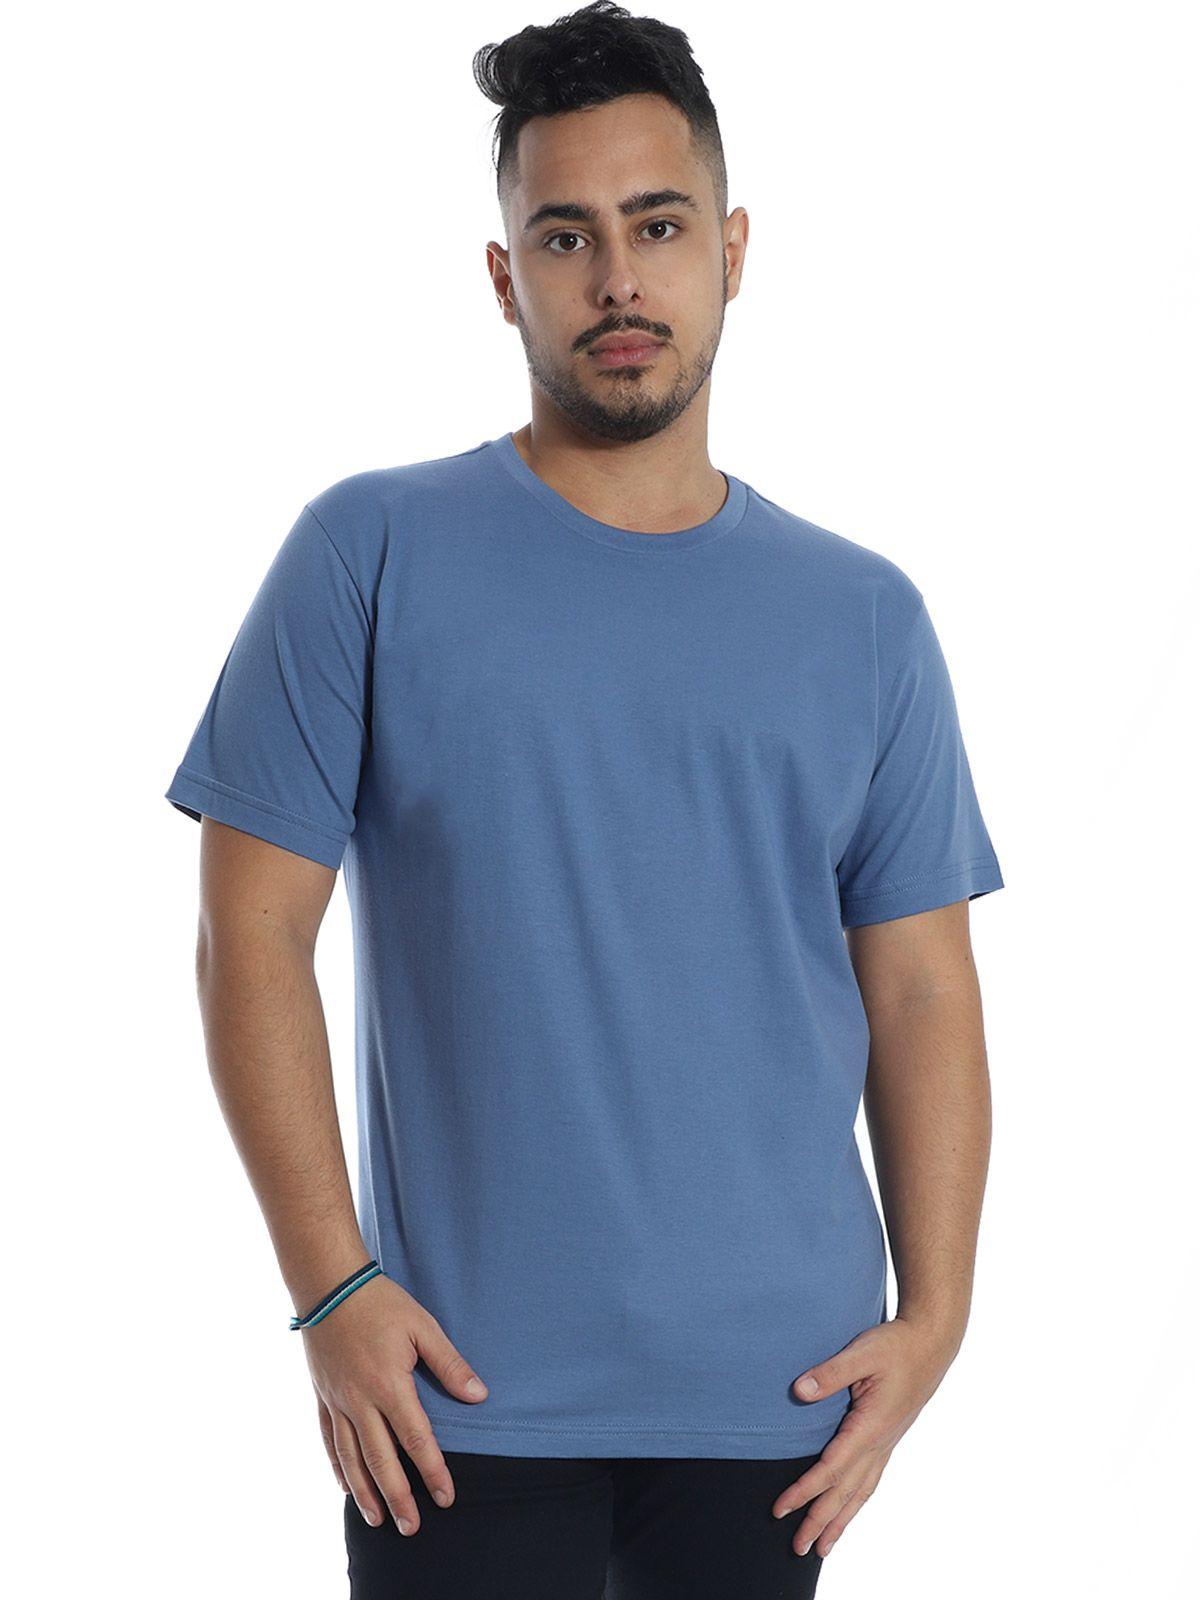 Camiseta Masculina Básica Lisa Indigo